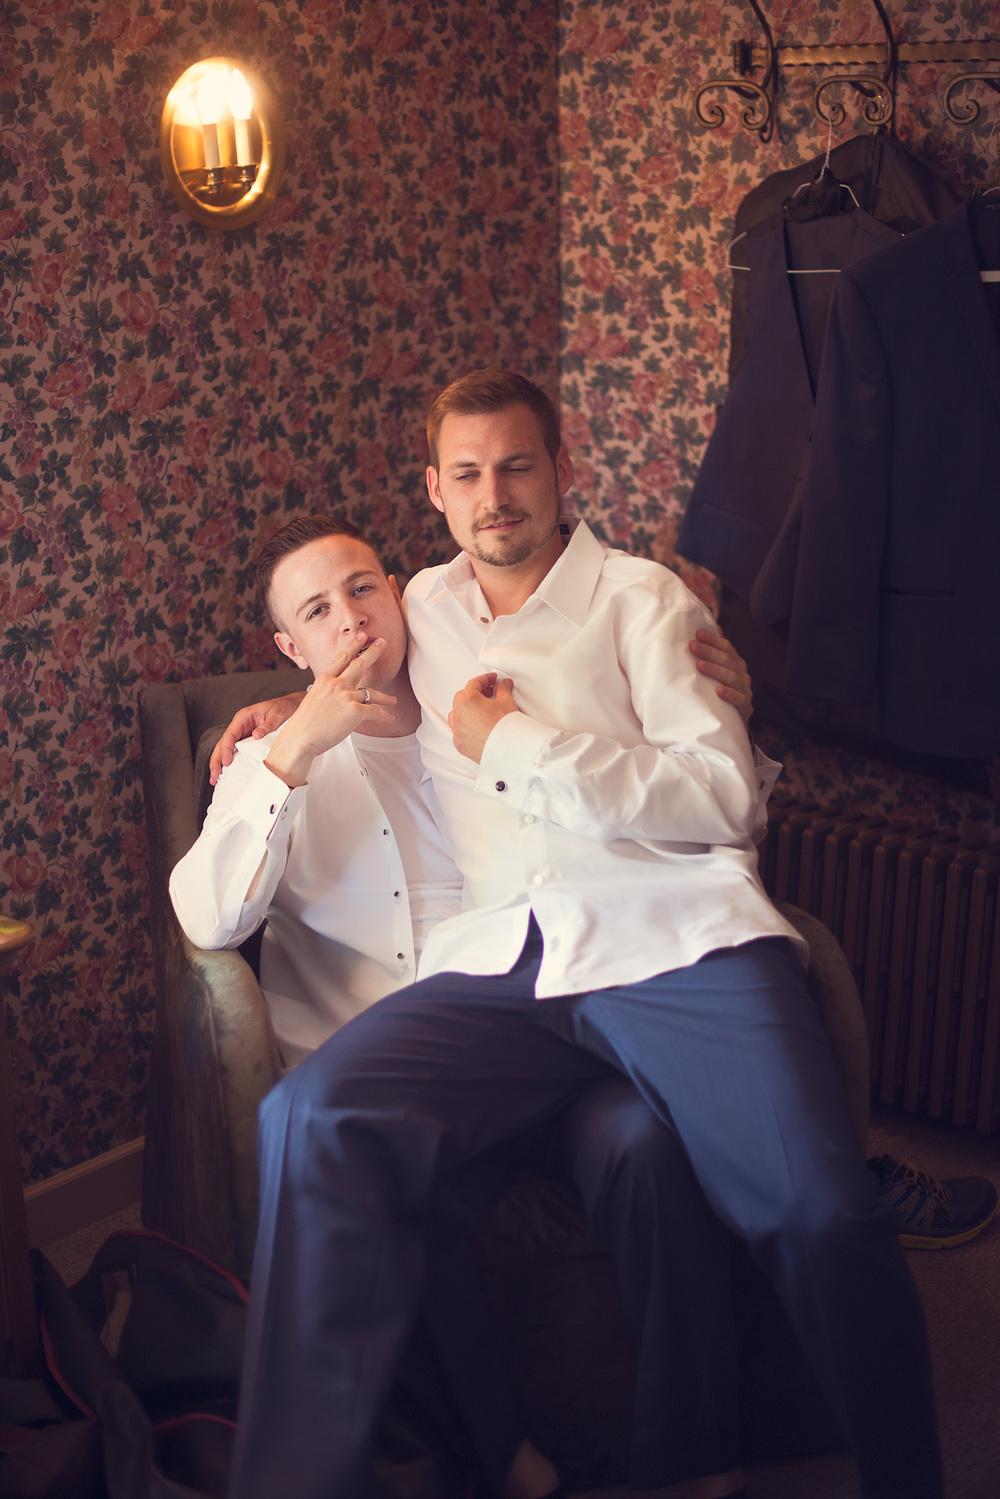 bros lap sitting groomsmen tuxedo